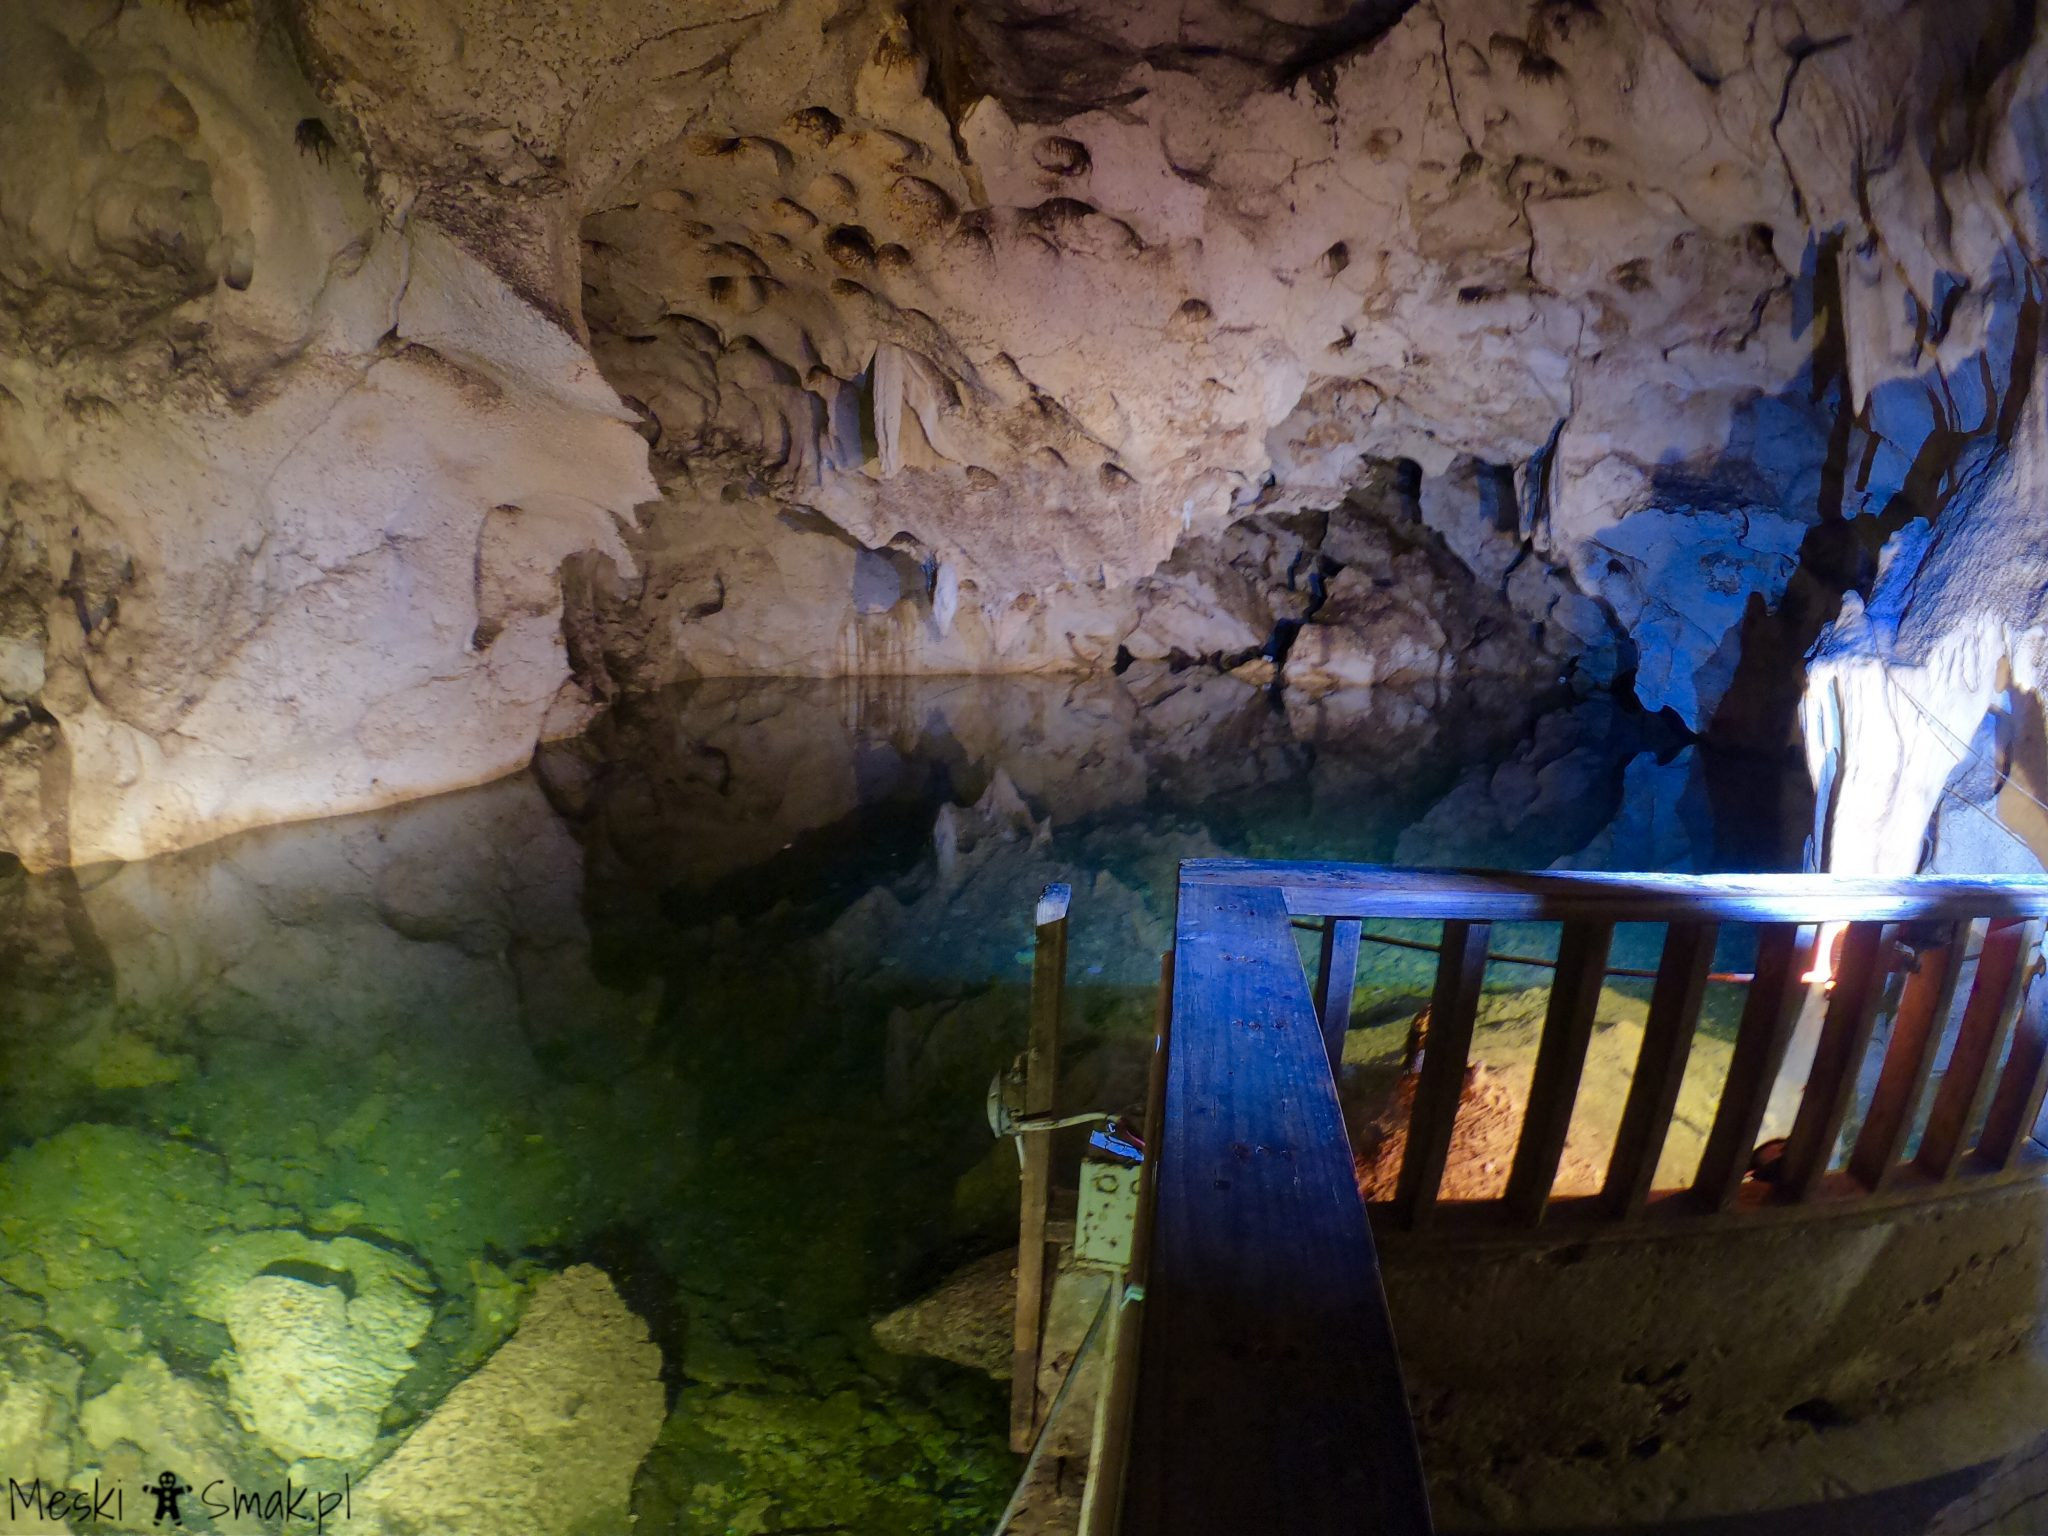 jamajka ciekawostki_Green Grotto Caves 4